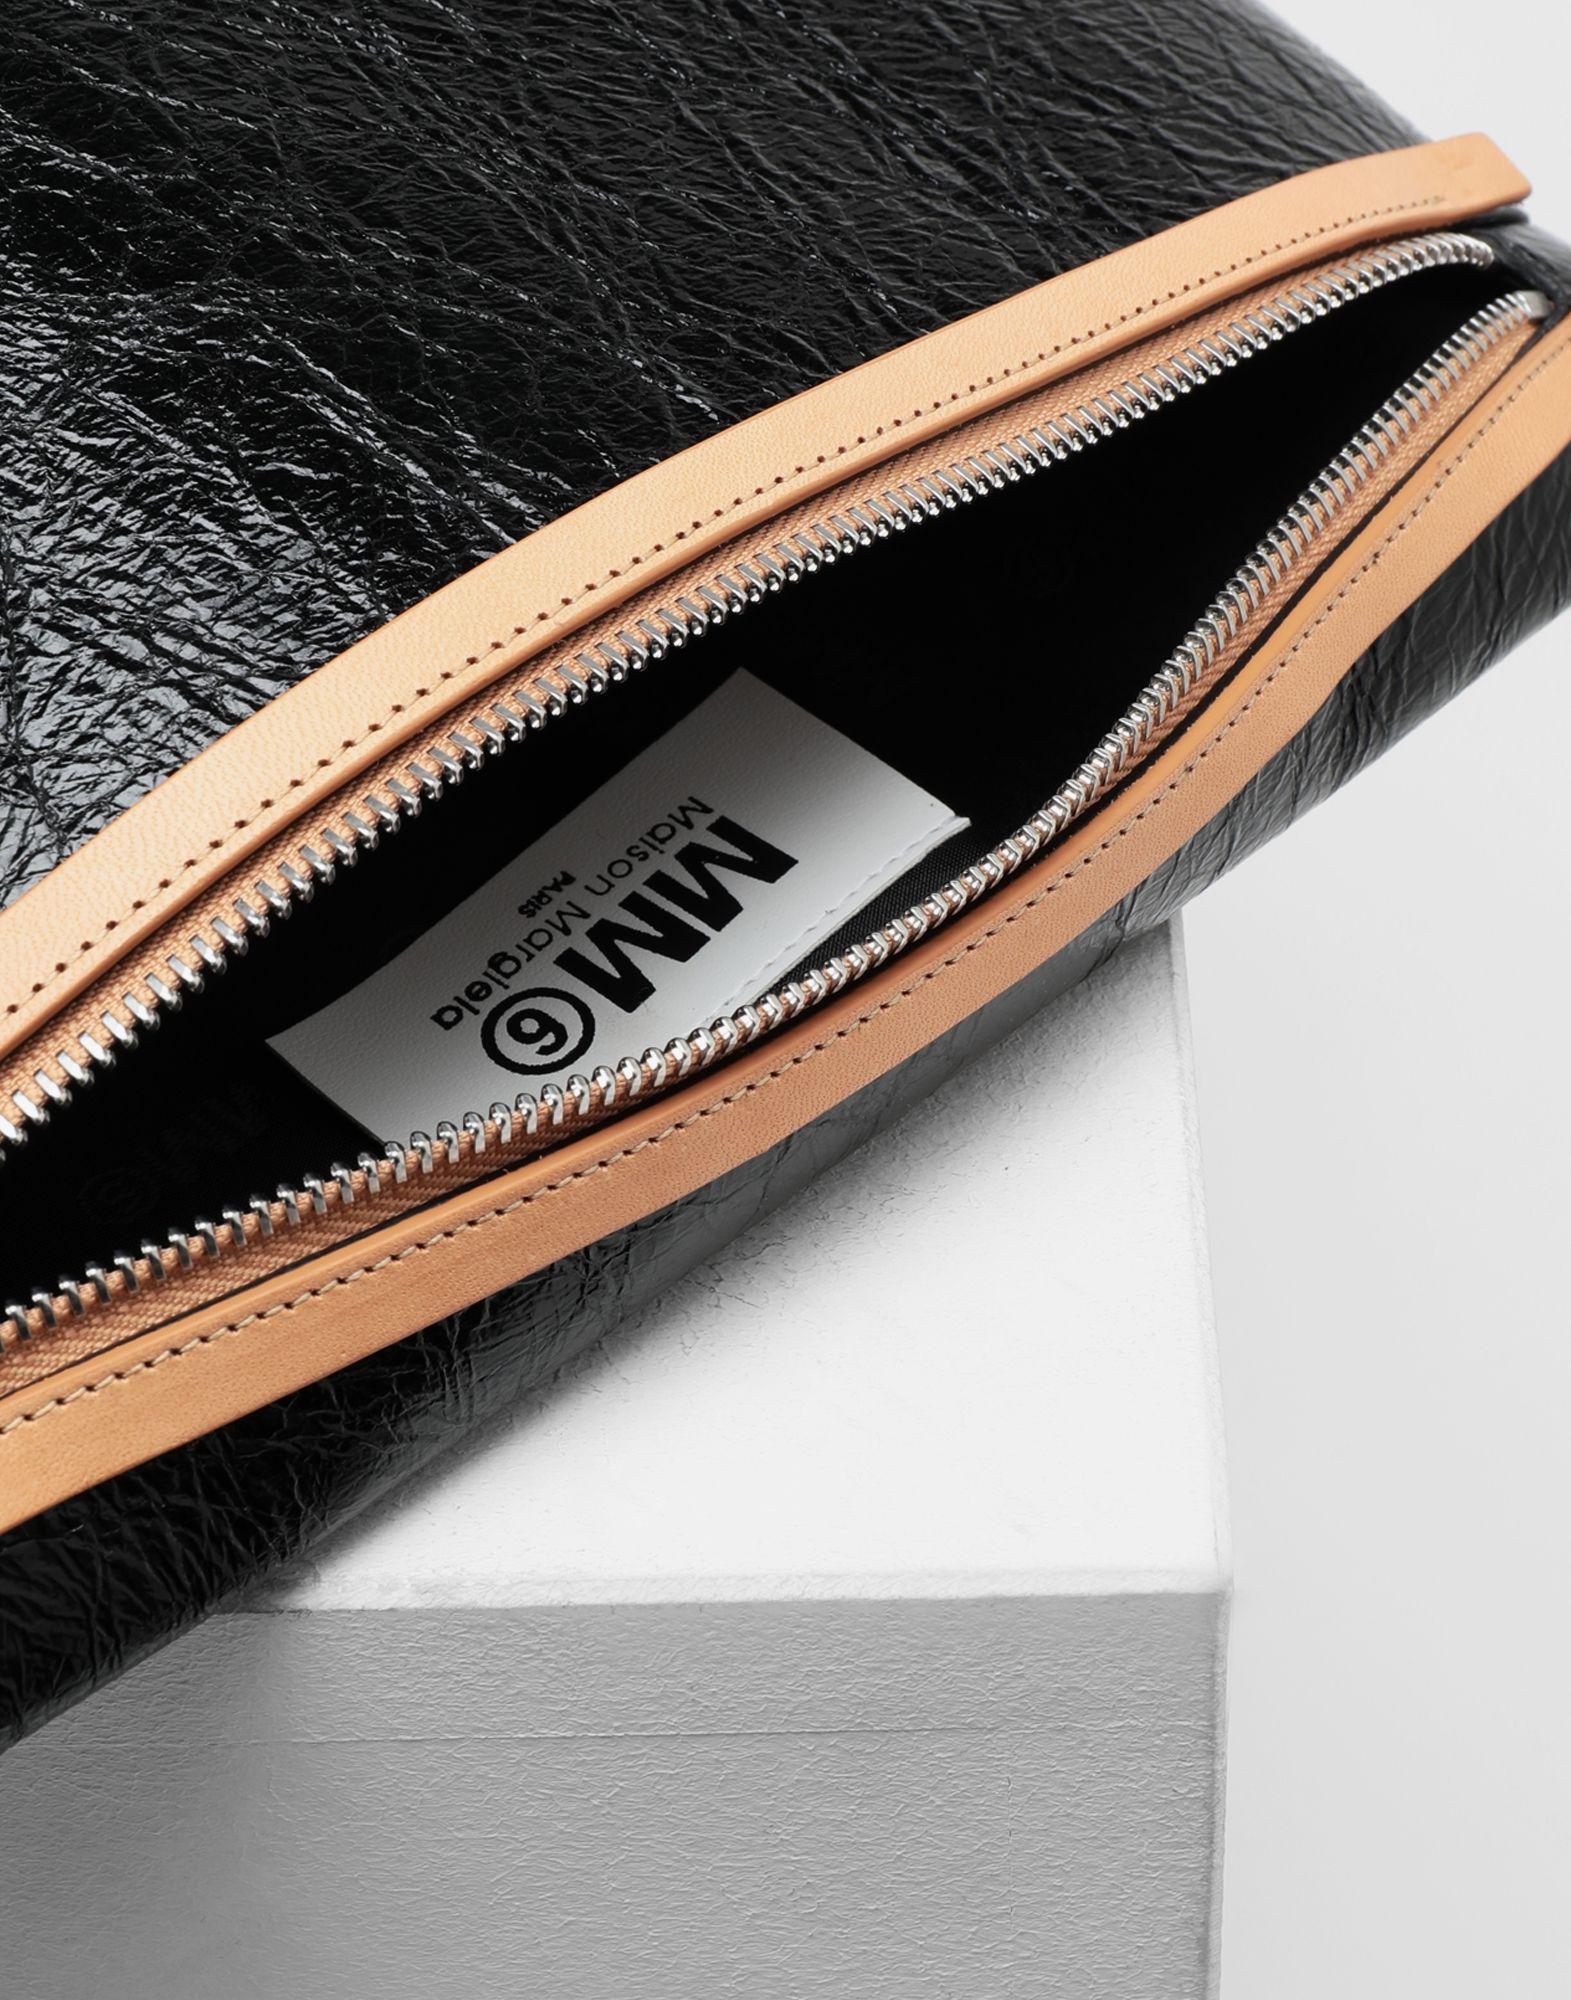 MM6 MAISON MARGIELA Crinkled leather zip pochette Wallets Woman e